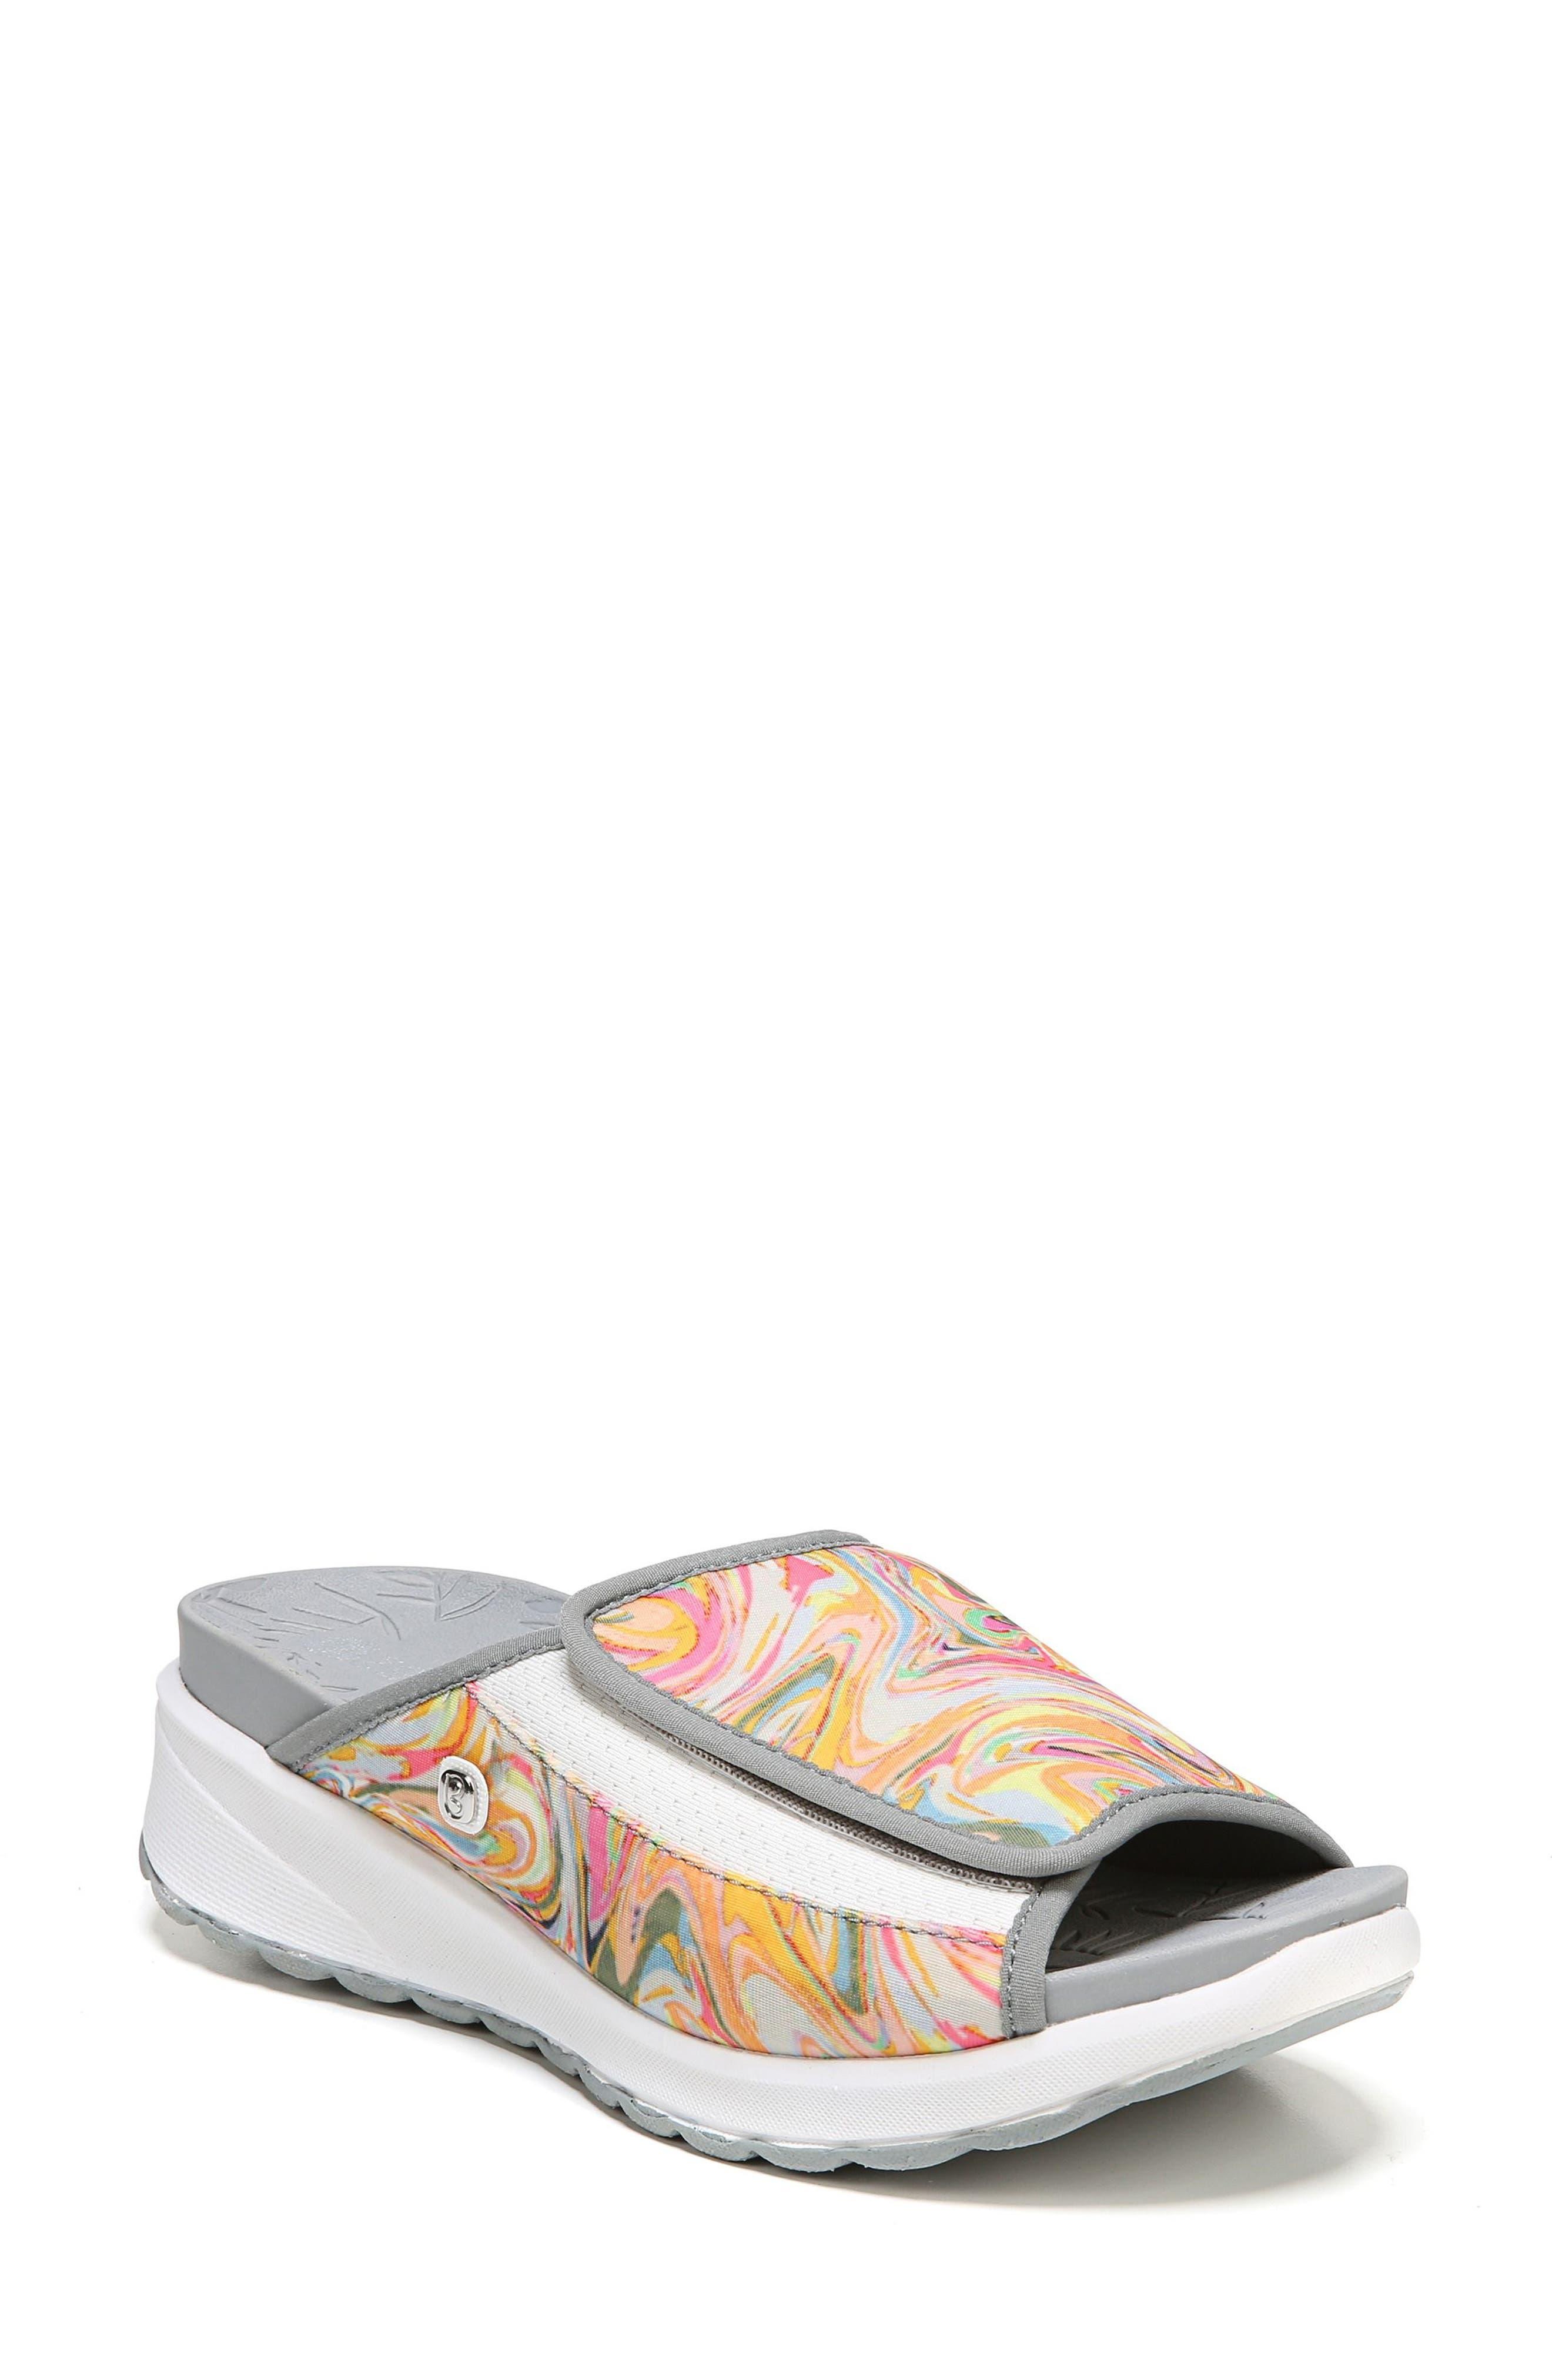 Galaxy Slide Sandal,                         Main,                         color, Lava Fabric